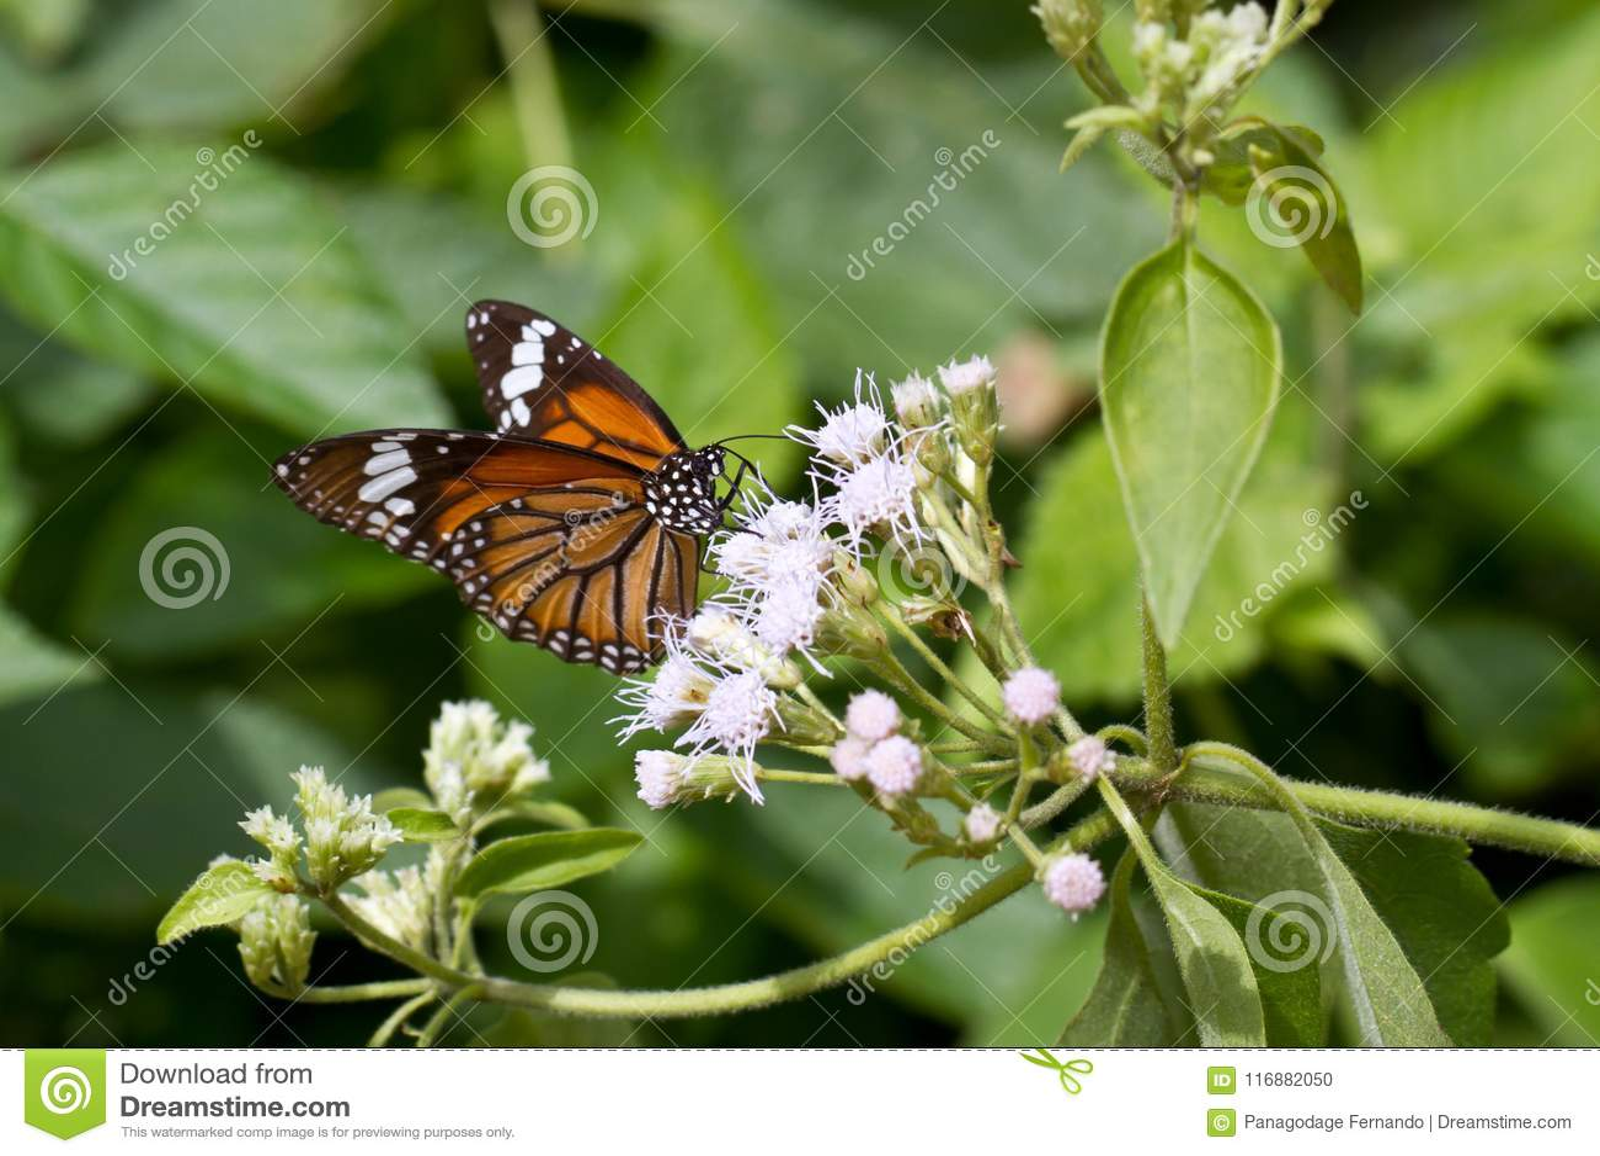 Common Tiger Butterfly - Danaus genutia in Ksandalama Sri Lanka